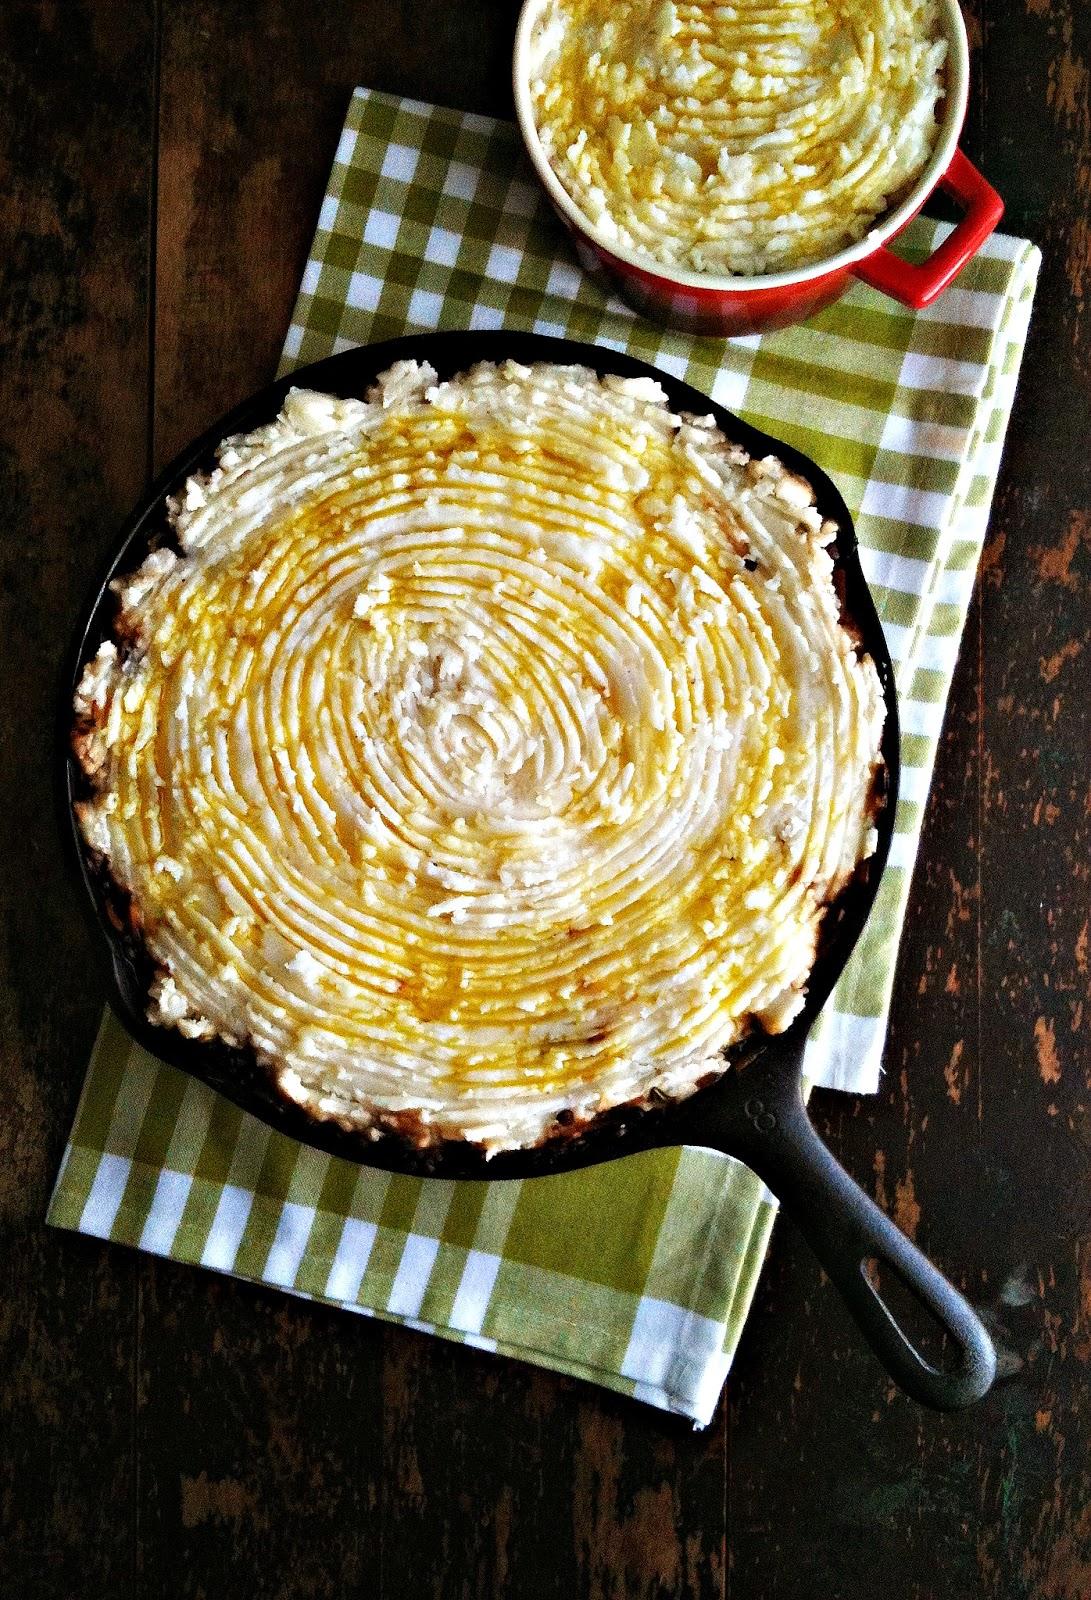 ... : Lentil & Kale Shepherd's Pie with Roasted Garlic Potatoes